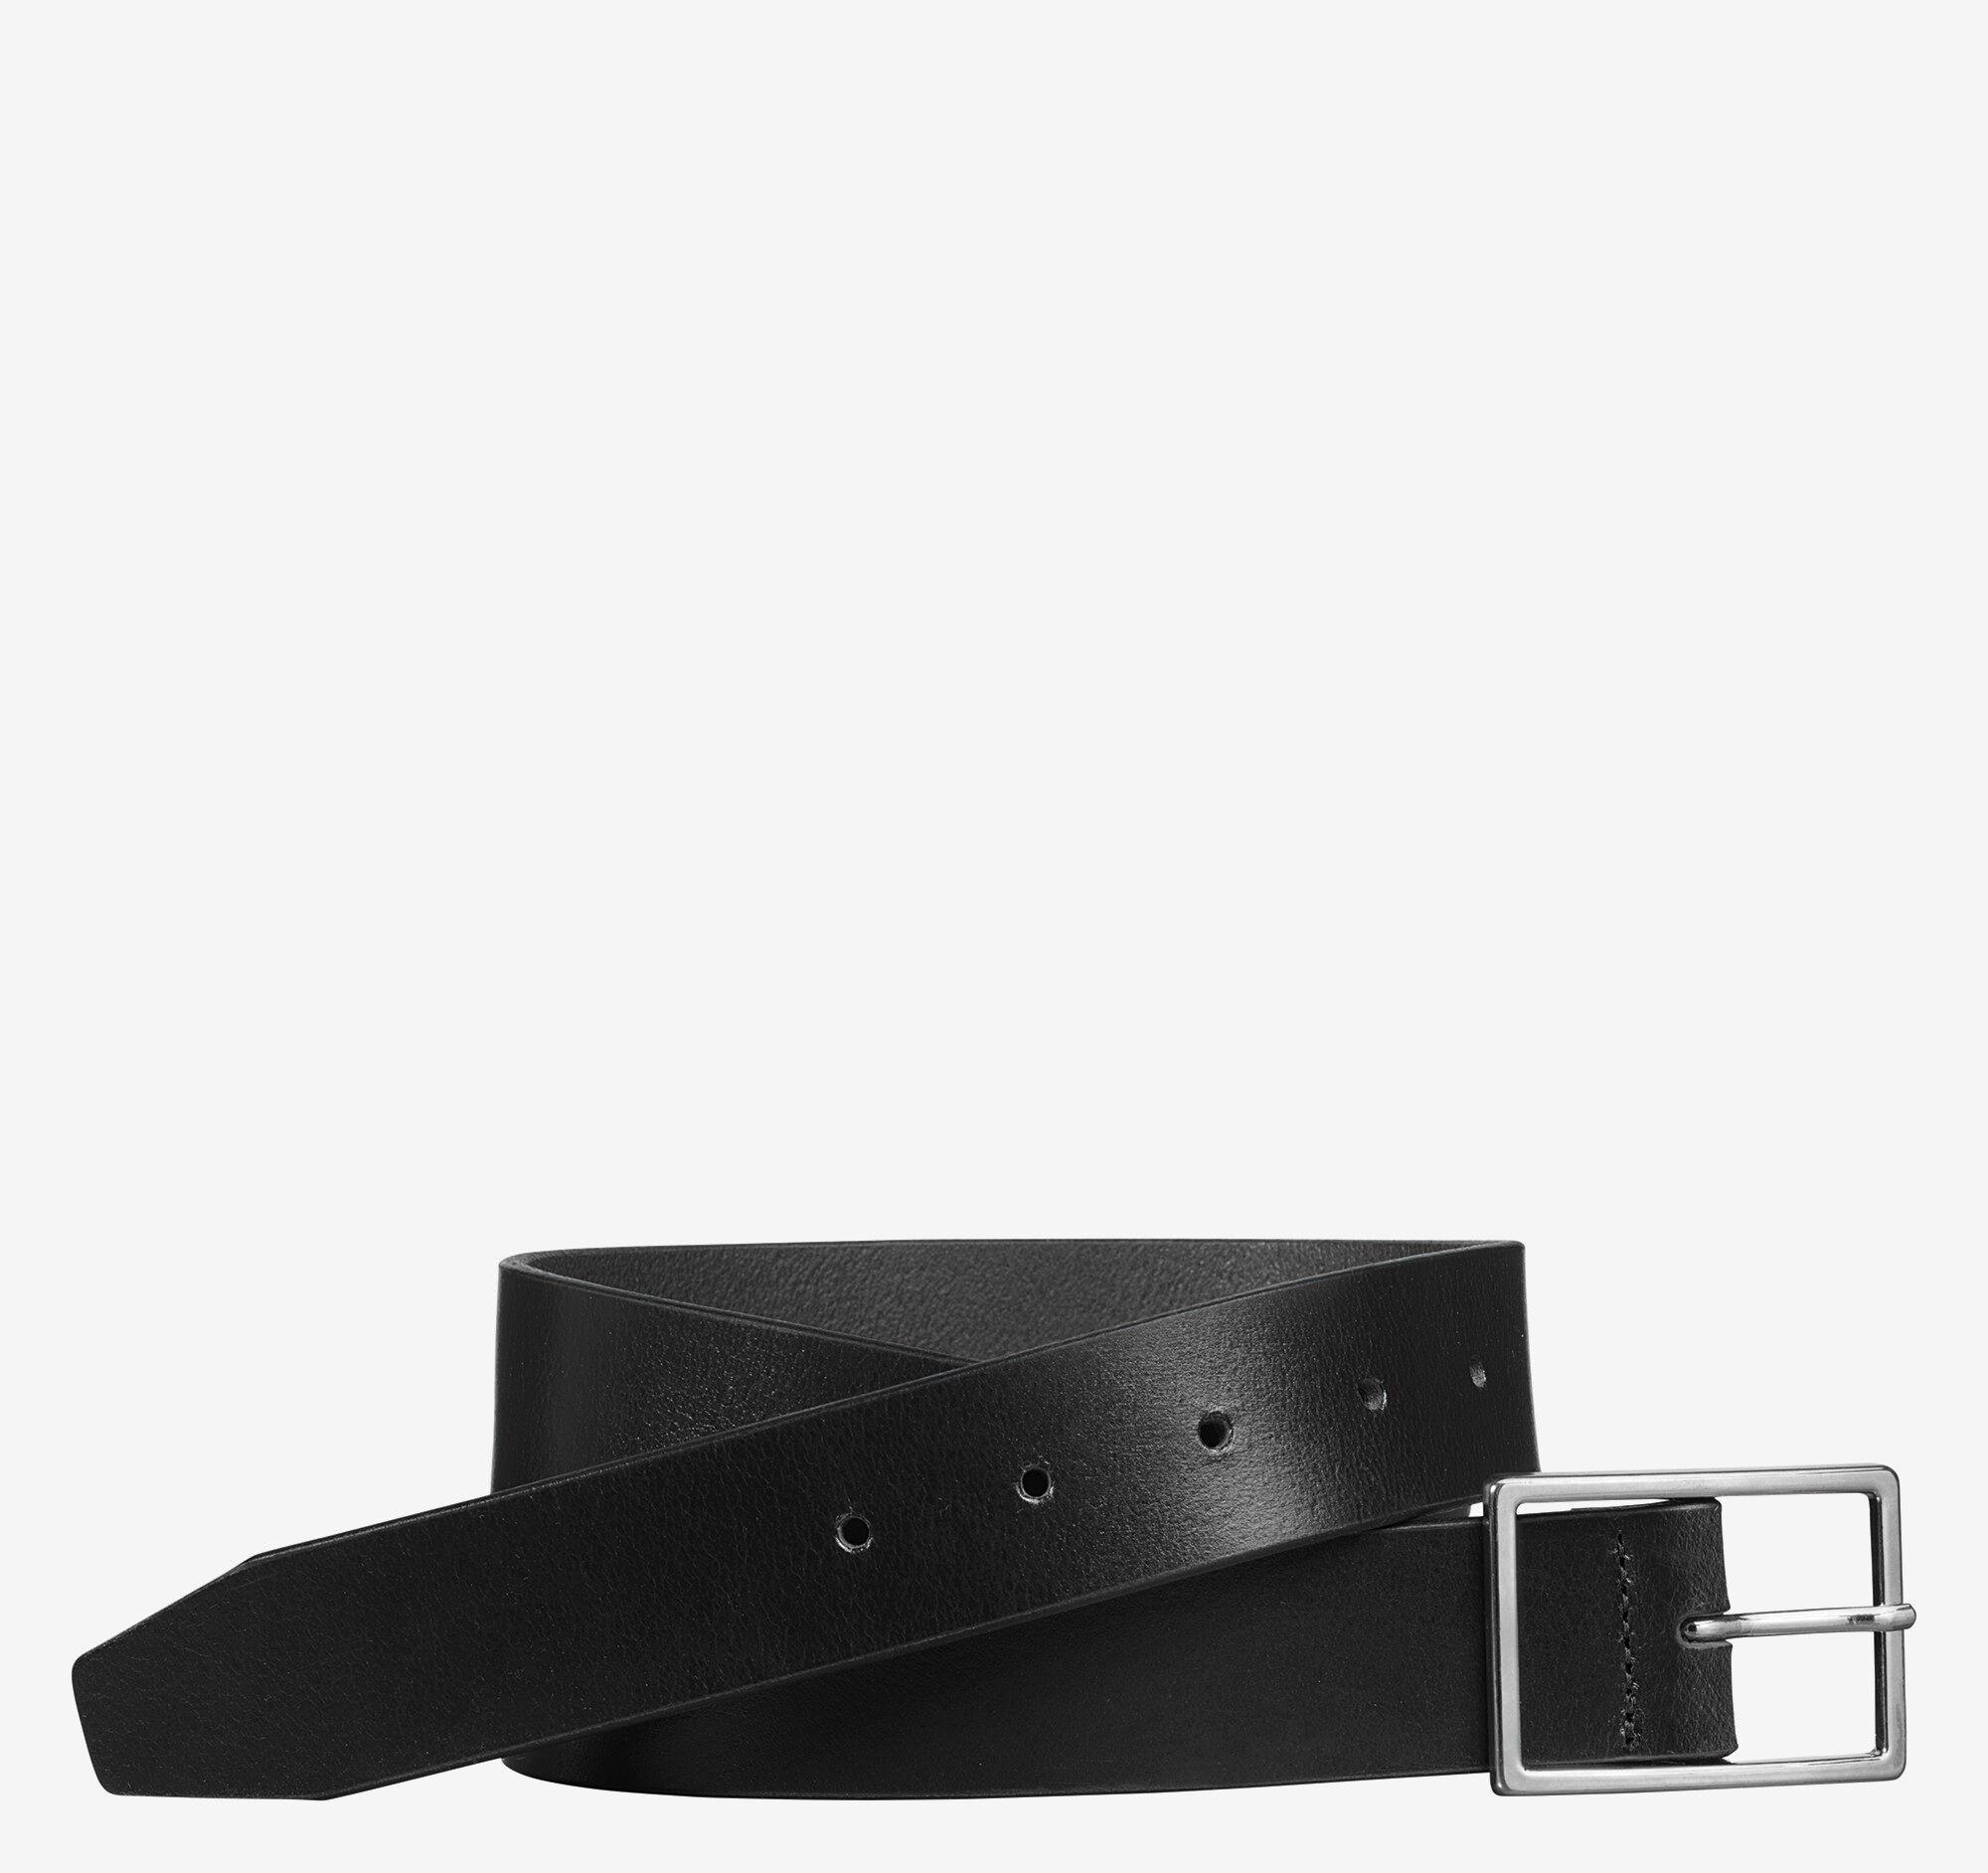 Johnston & Murphy Men's Polished-Nickel Buckle Belt - Black - Size 32